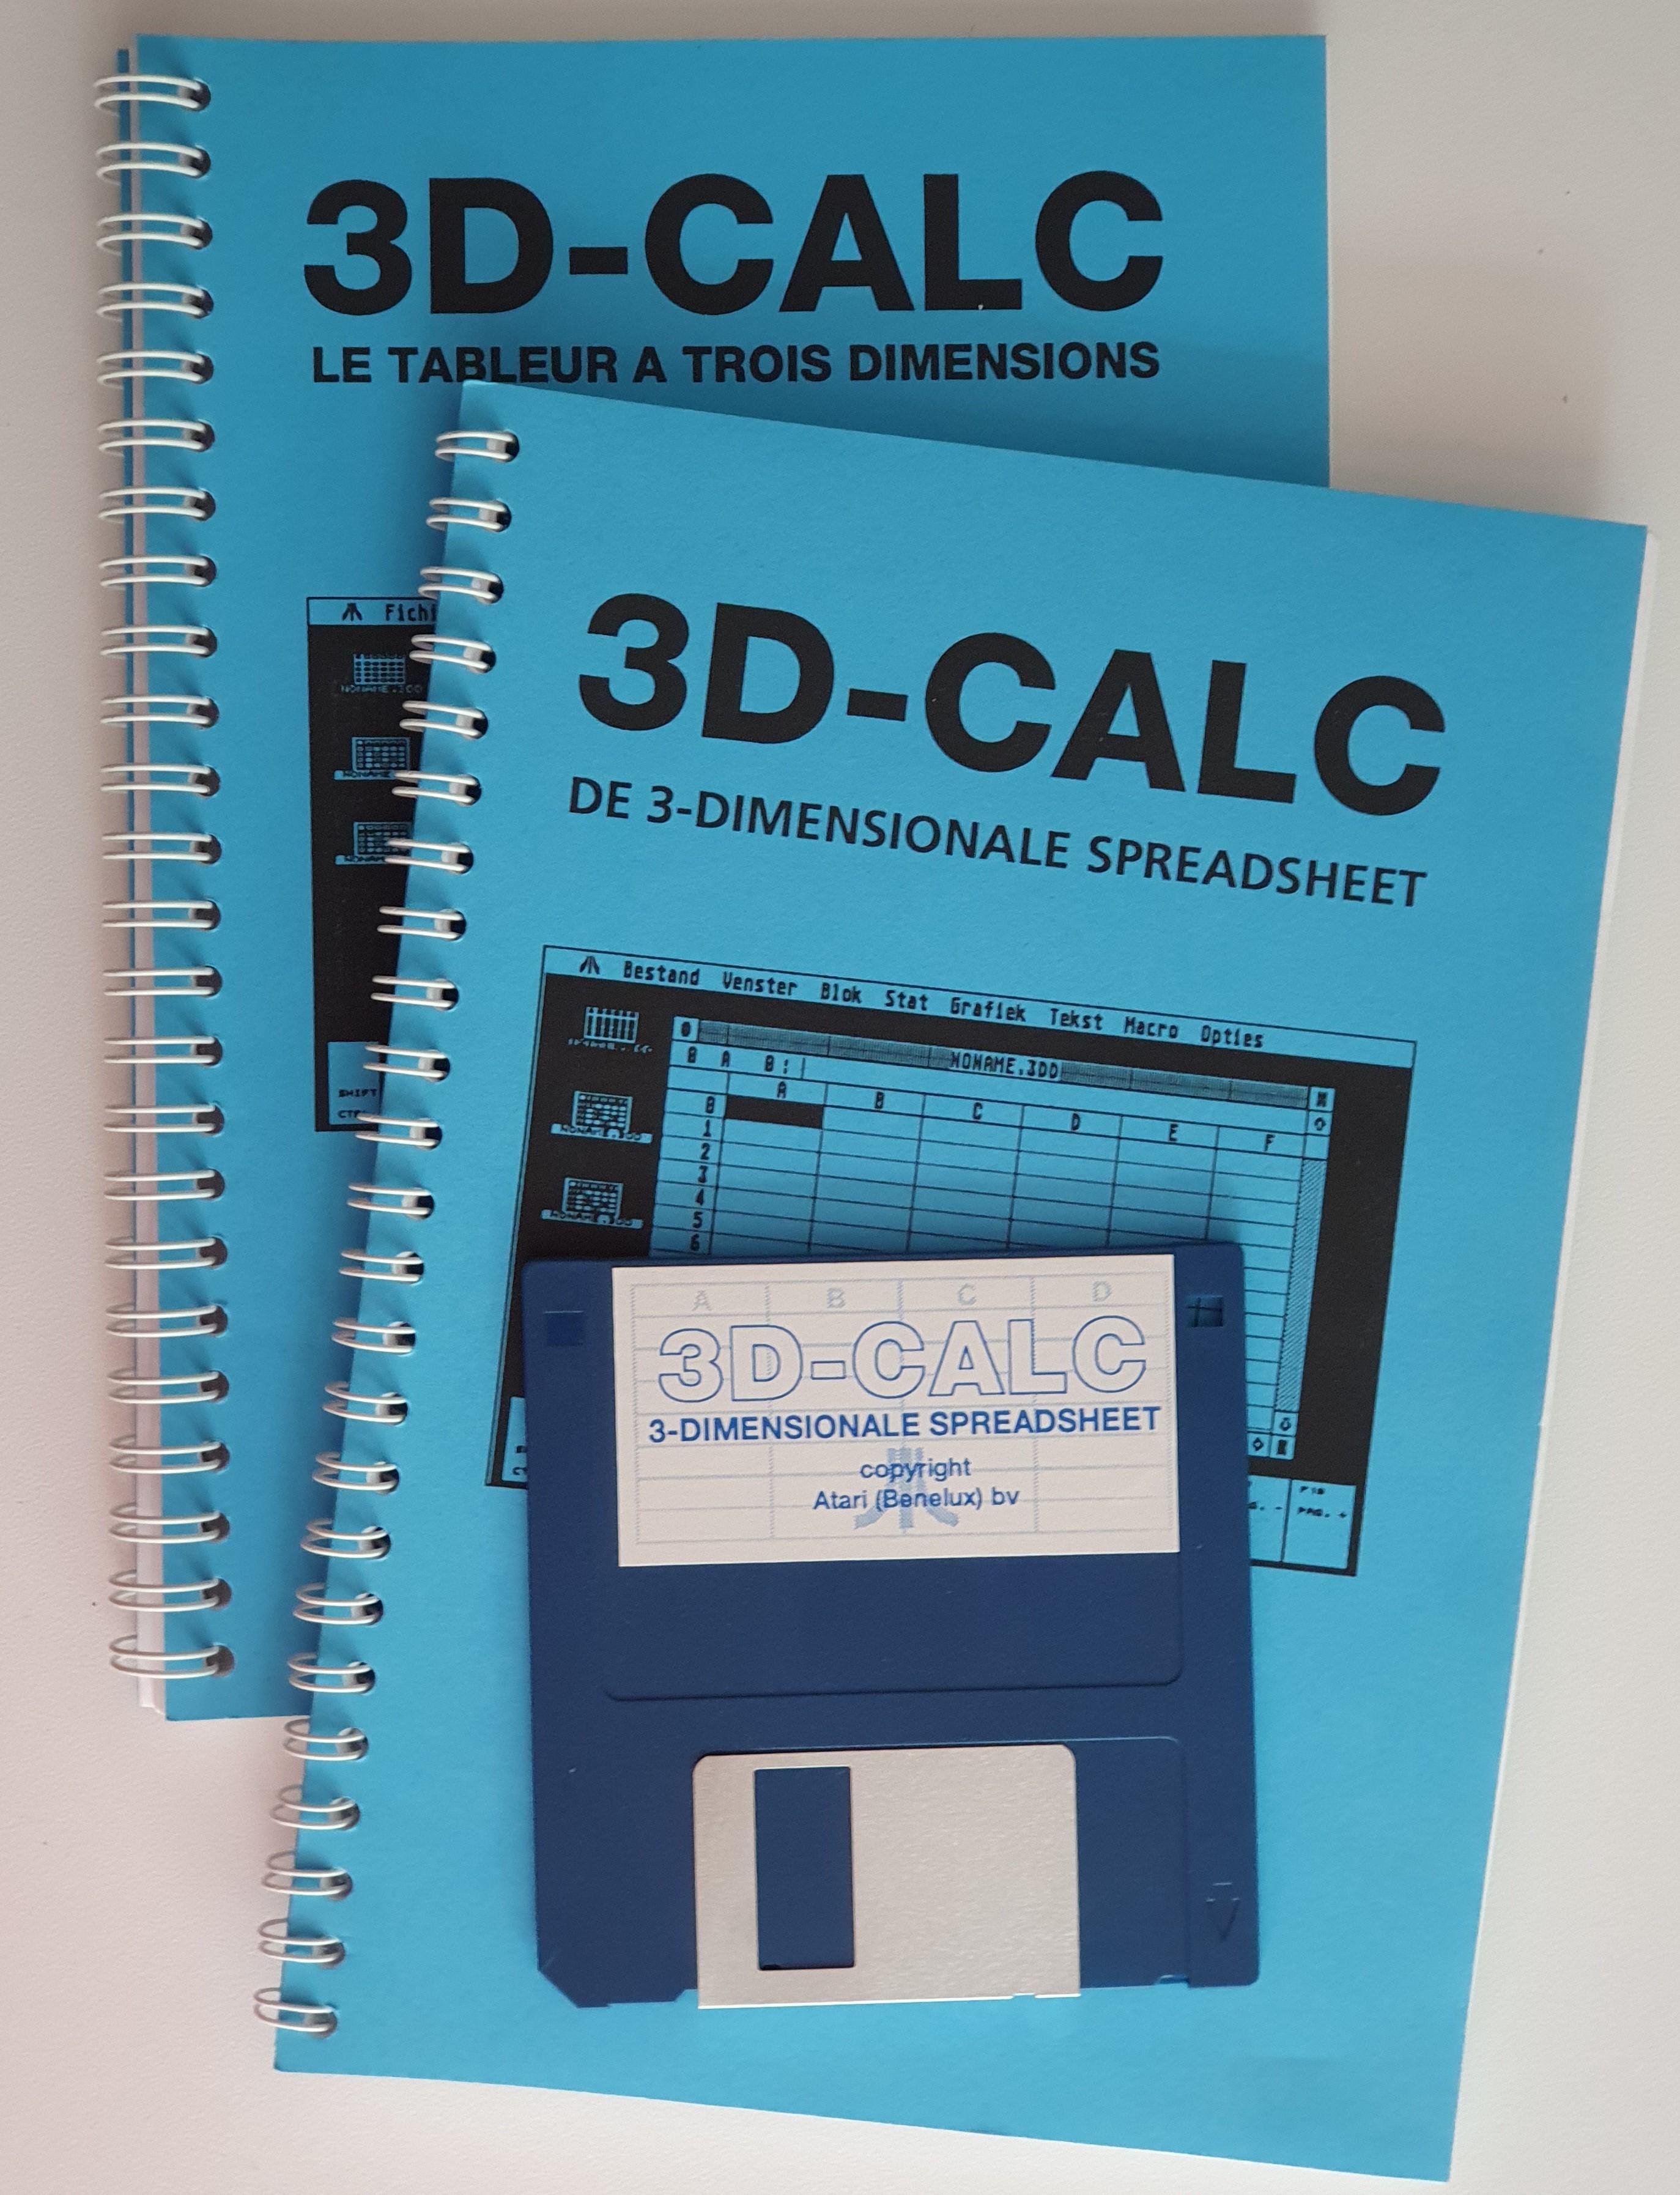 The Atari Benelux release of 3D-Calc.